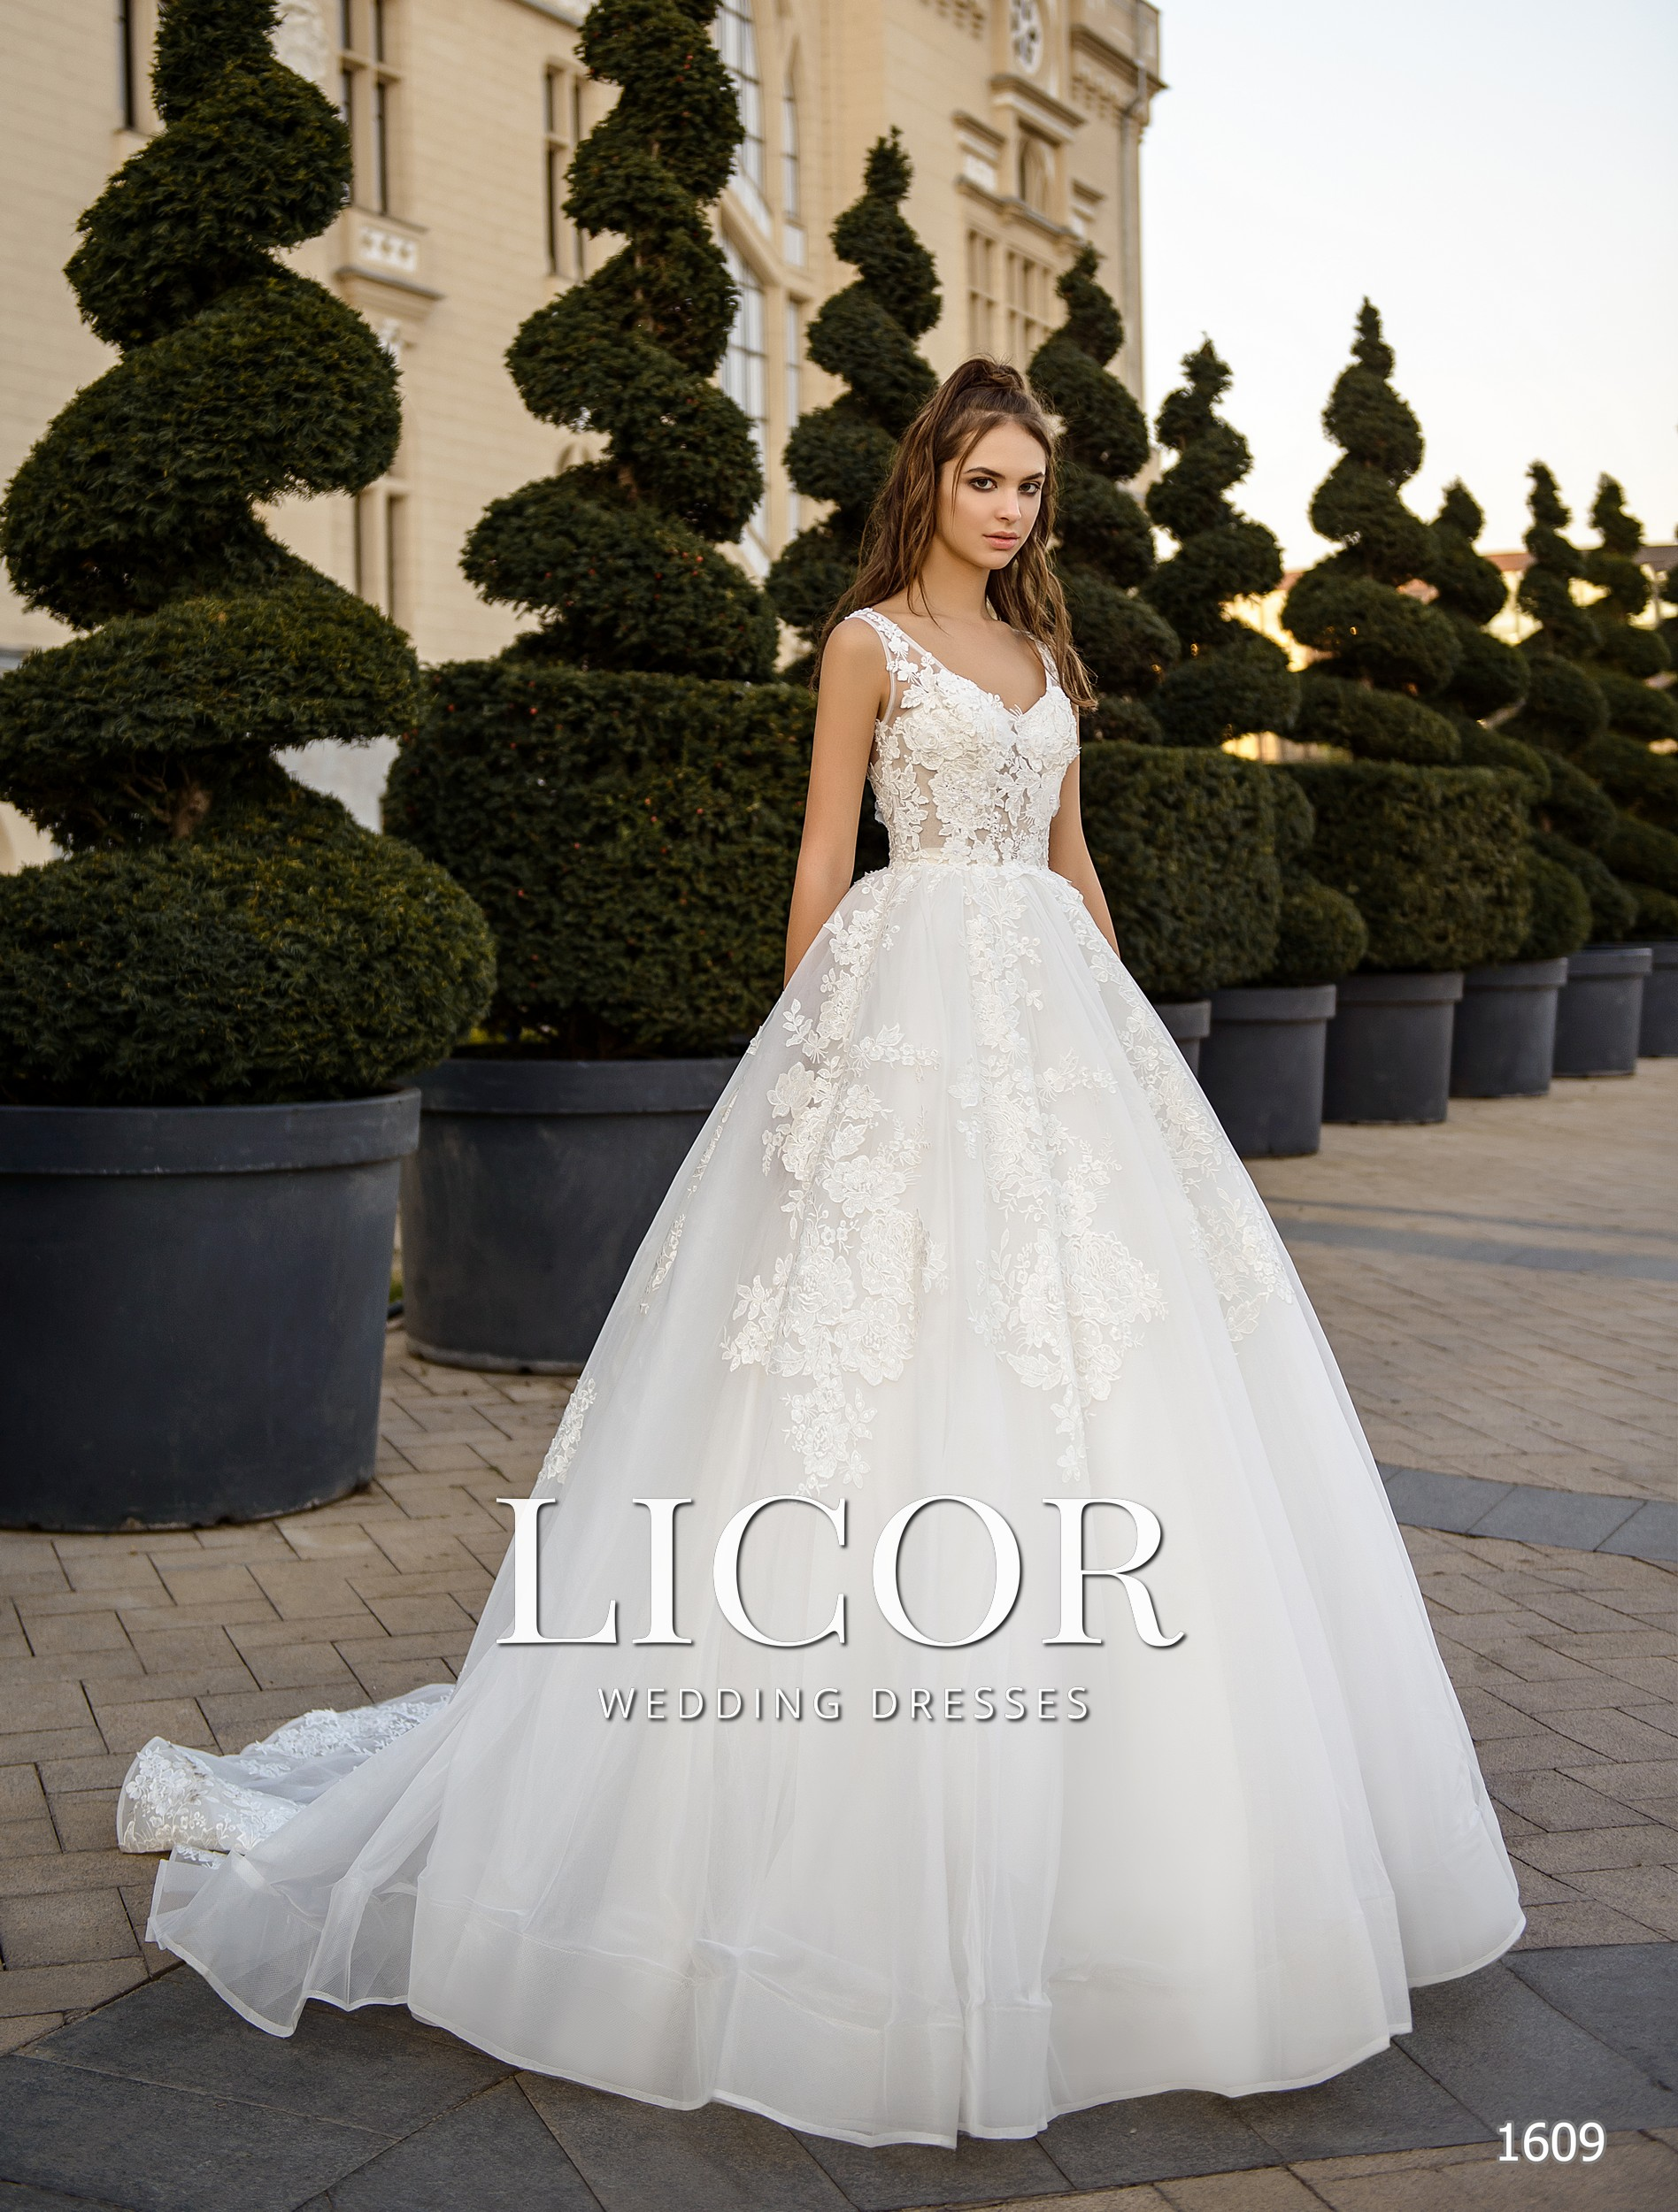 https://licor.com.ua/images/stories/virtuemart/product/1609(1).jpg